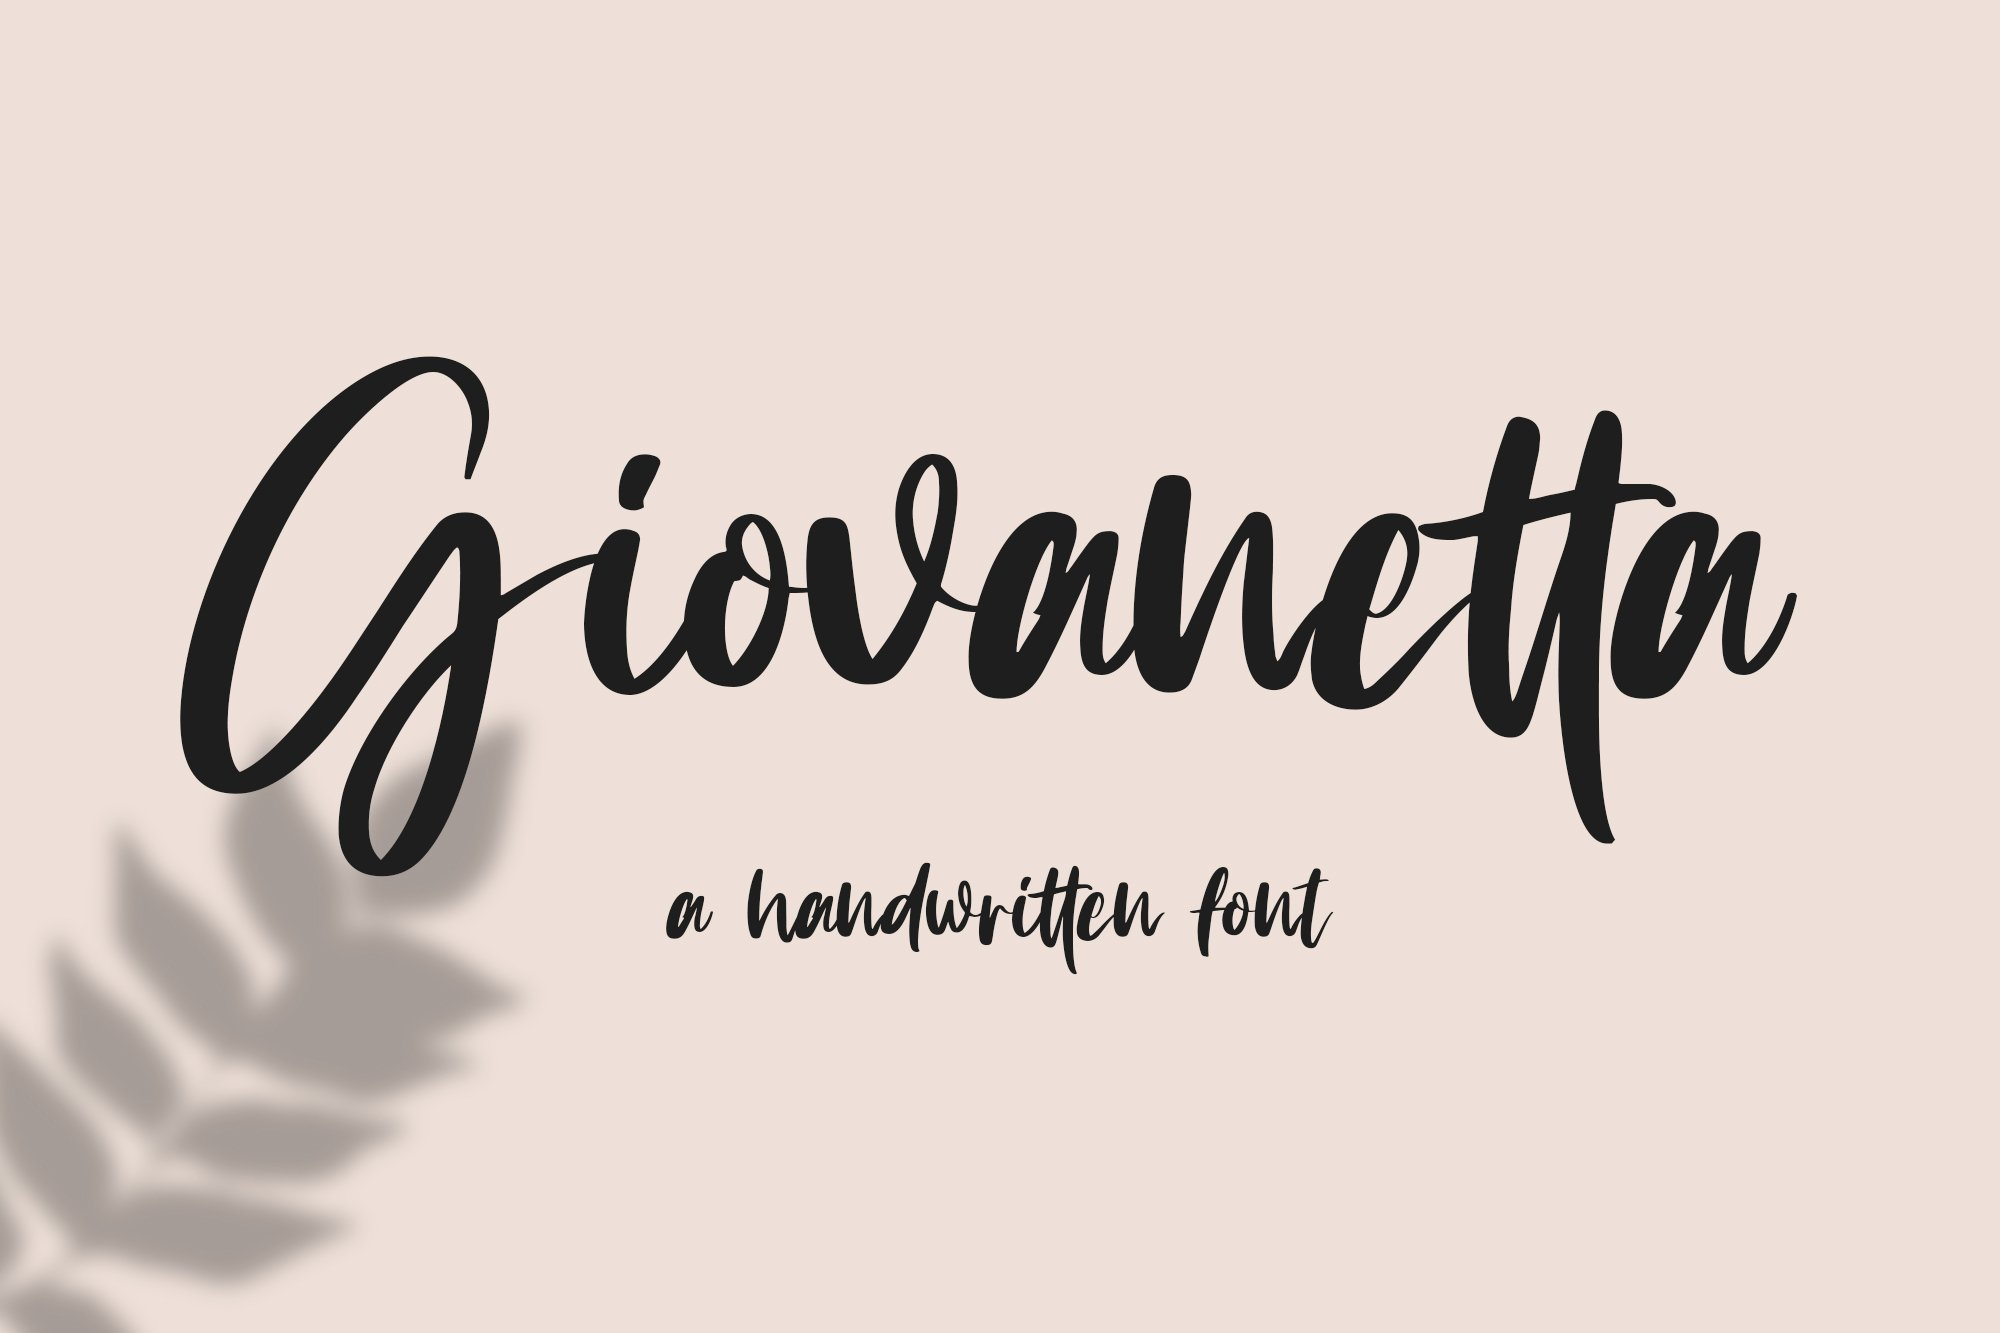 Giovanetta handwritten font example image 1